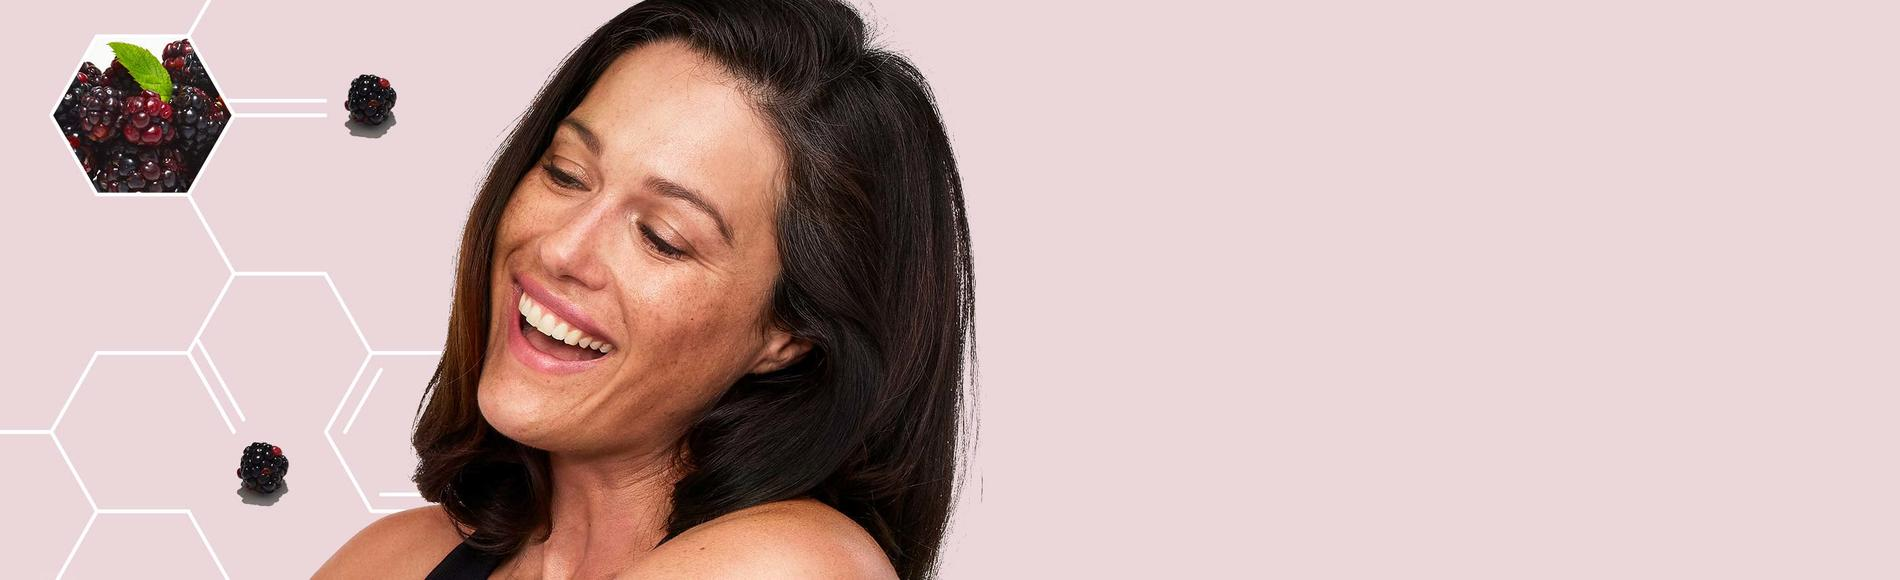 Mujer alegre que usa la loción corporal reafirmante Positively Ageless de Aveeno